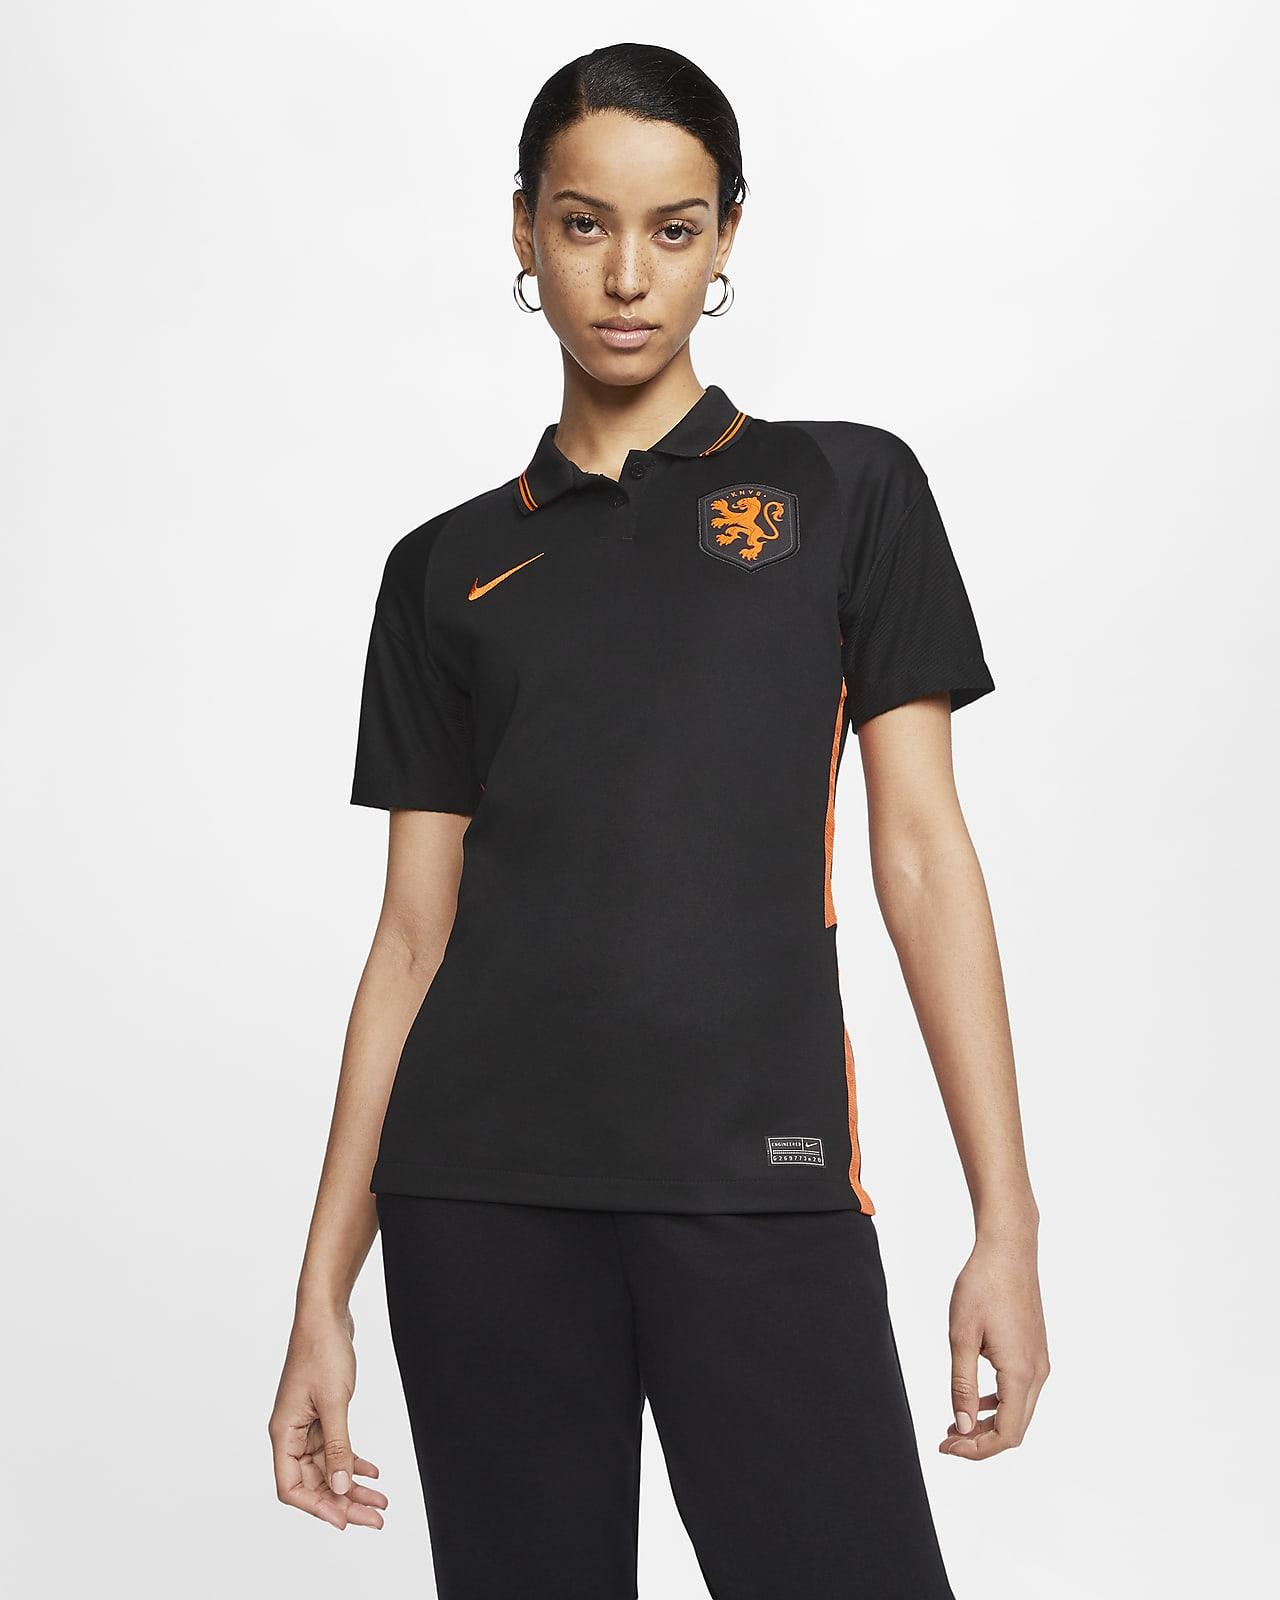 Nederland 2020 Stadium Uit Voetbalshirt voor dames